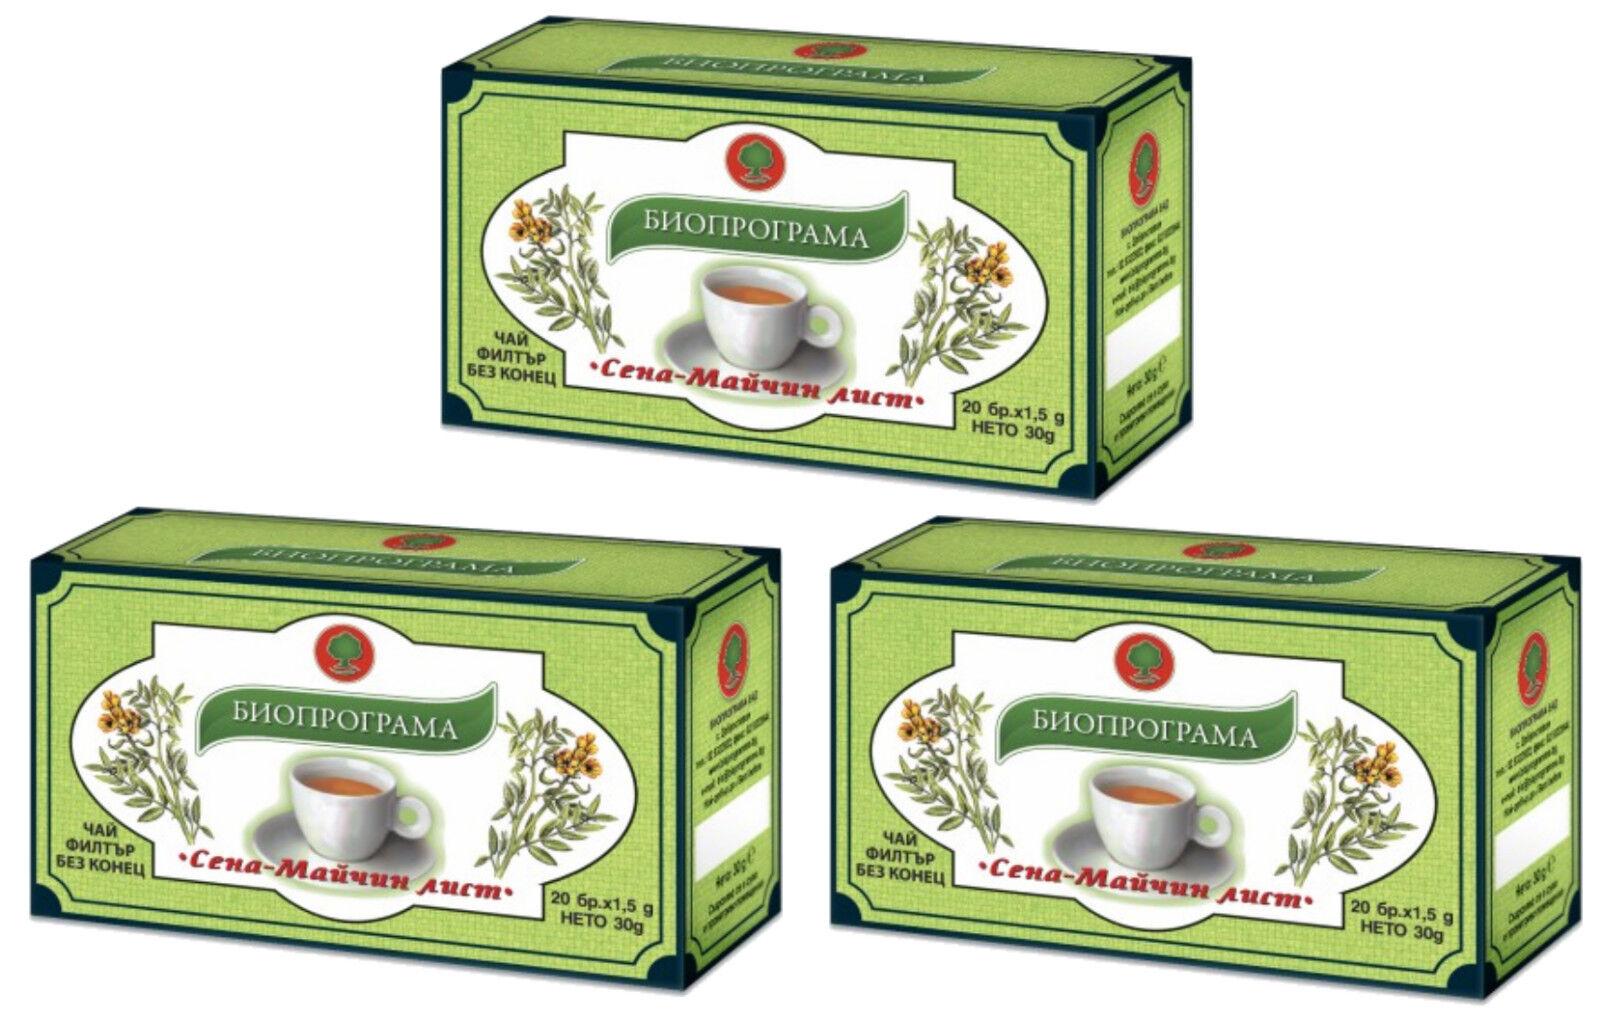 3 BOXES SENNA TEA Colon Cleansing / Laxative / Detox 60 bags